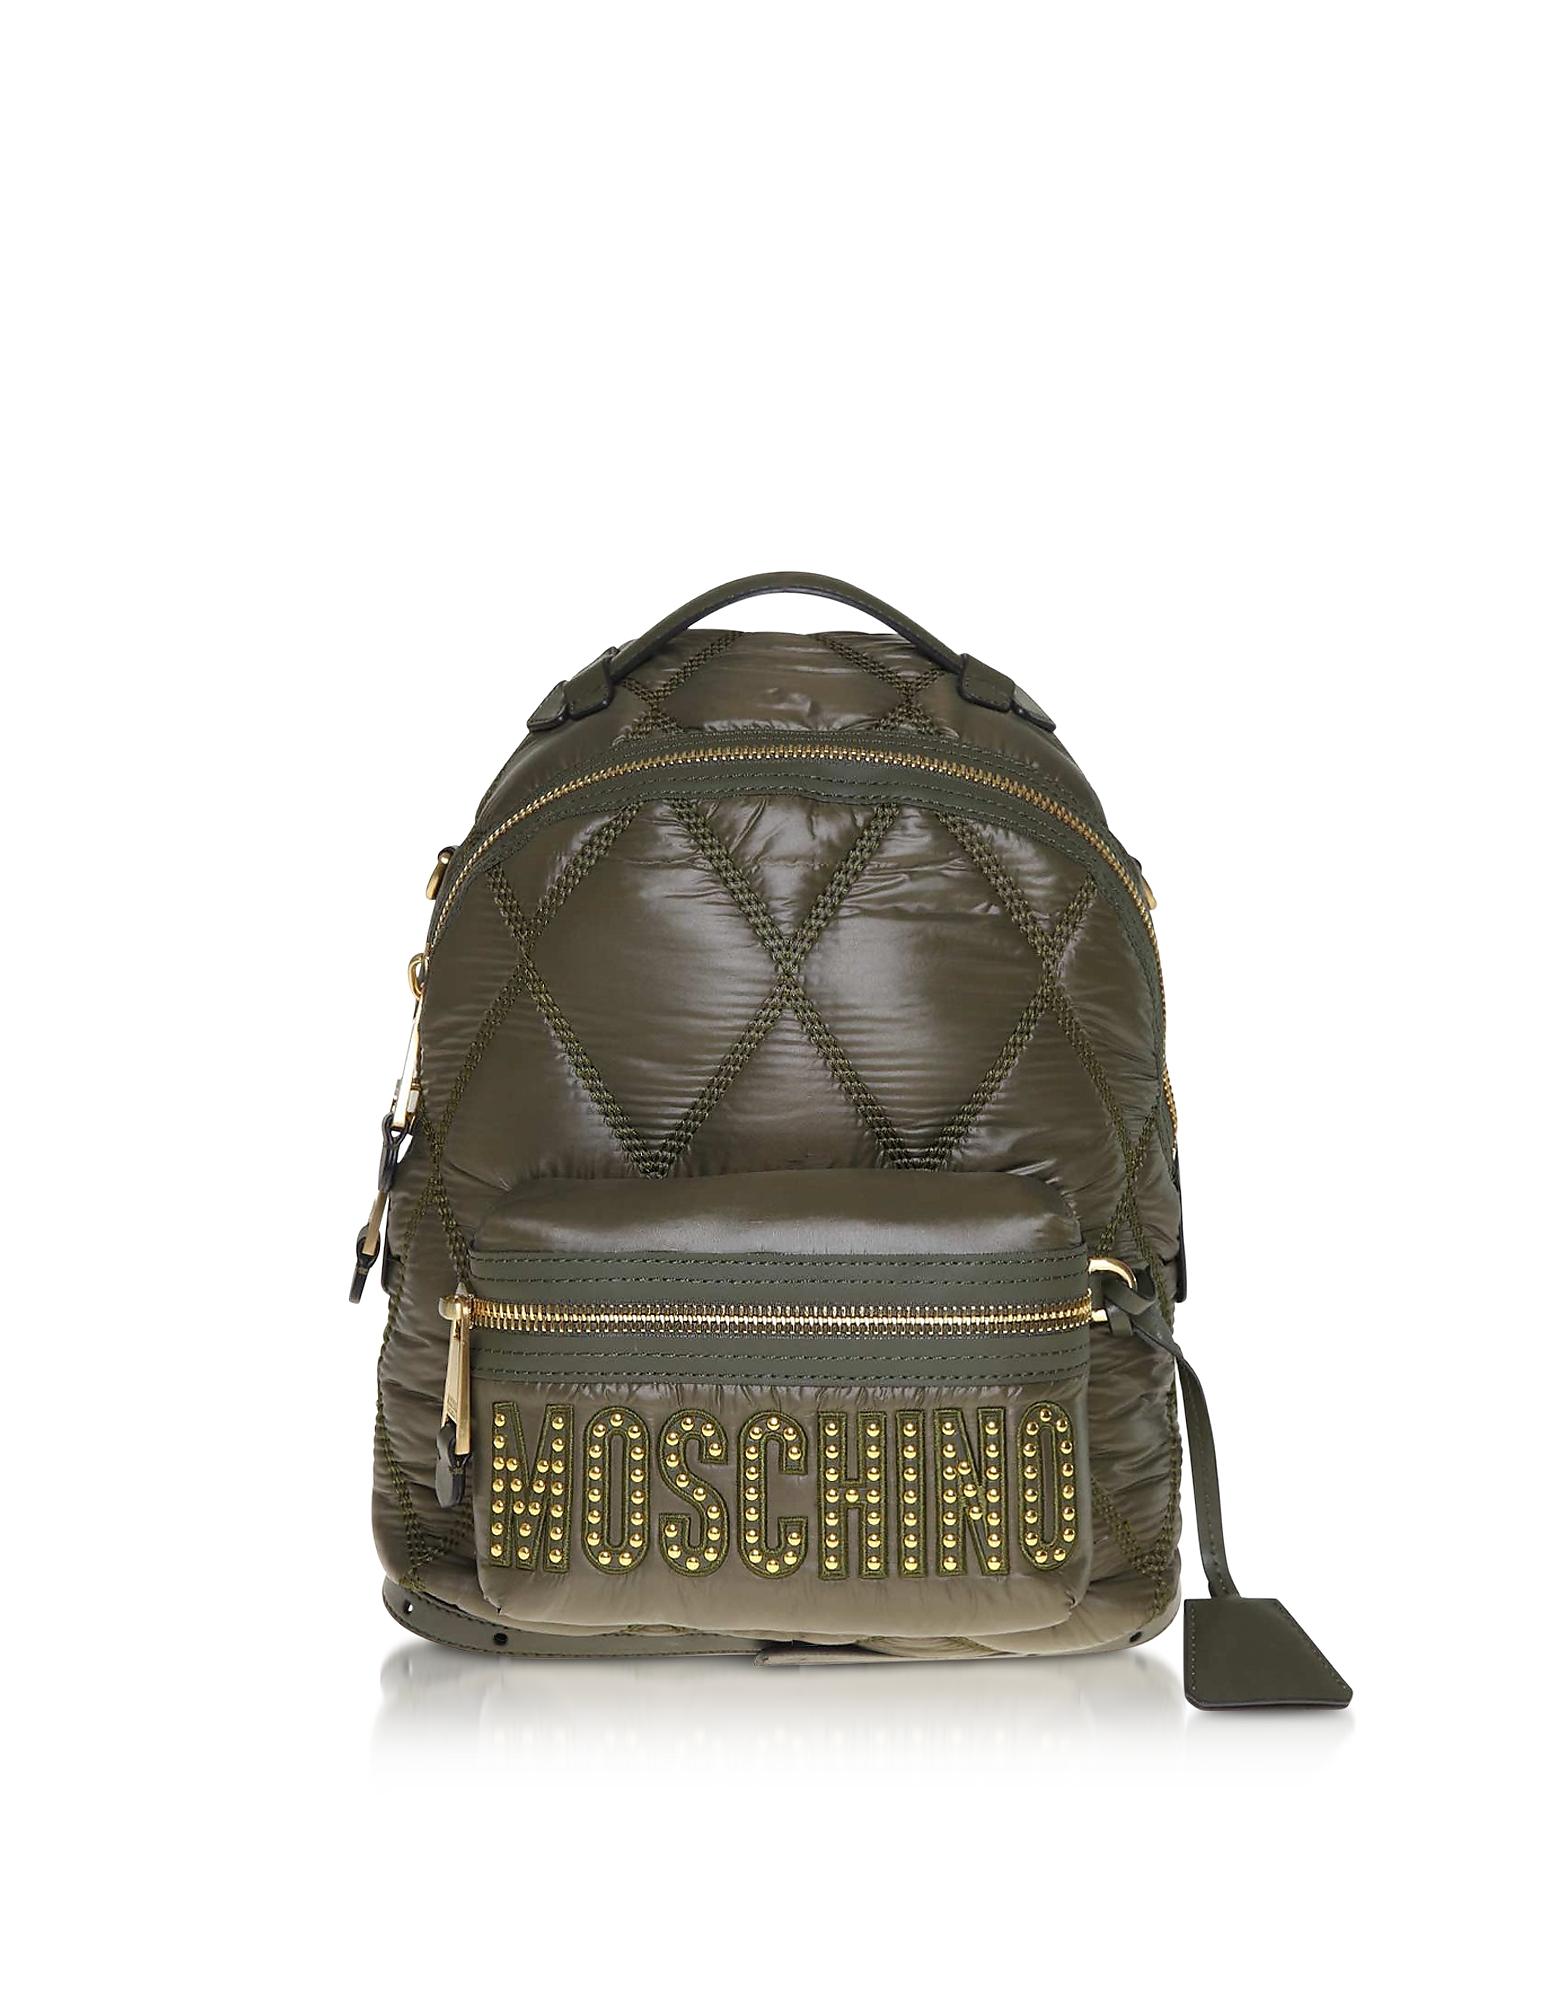 Moschino Designer Handbags, Green Quilted Nylon Signature Backpack